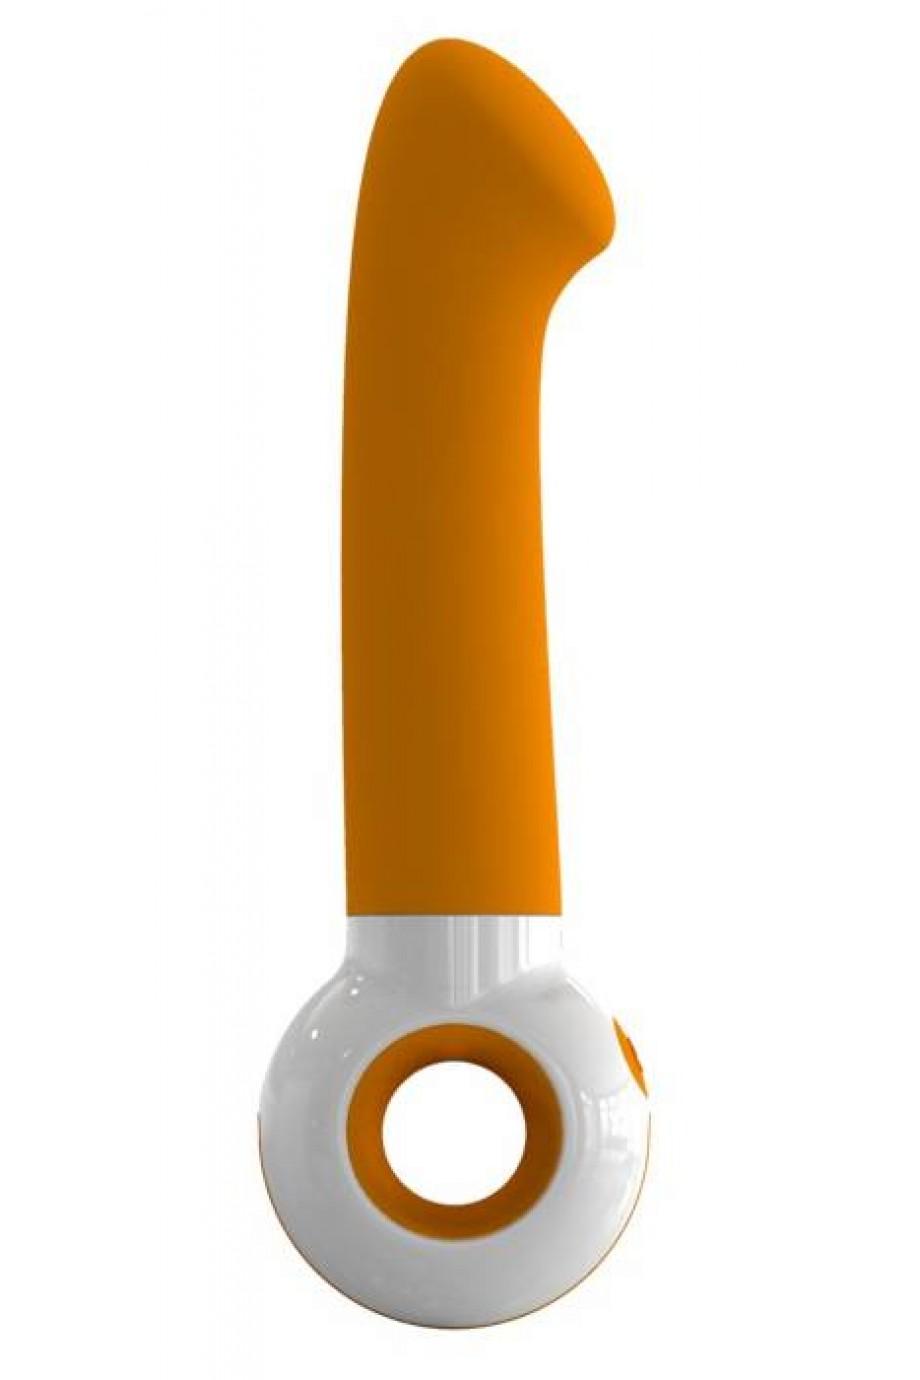 Вибратор O-zone оранжево-белый 18 см